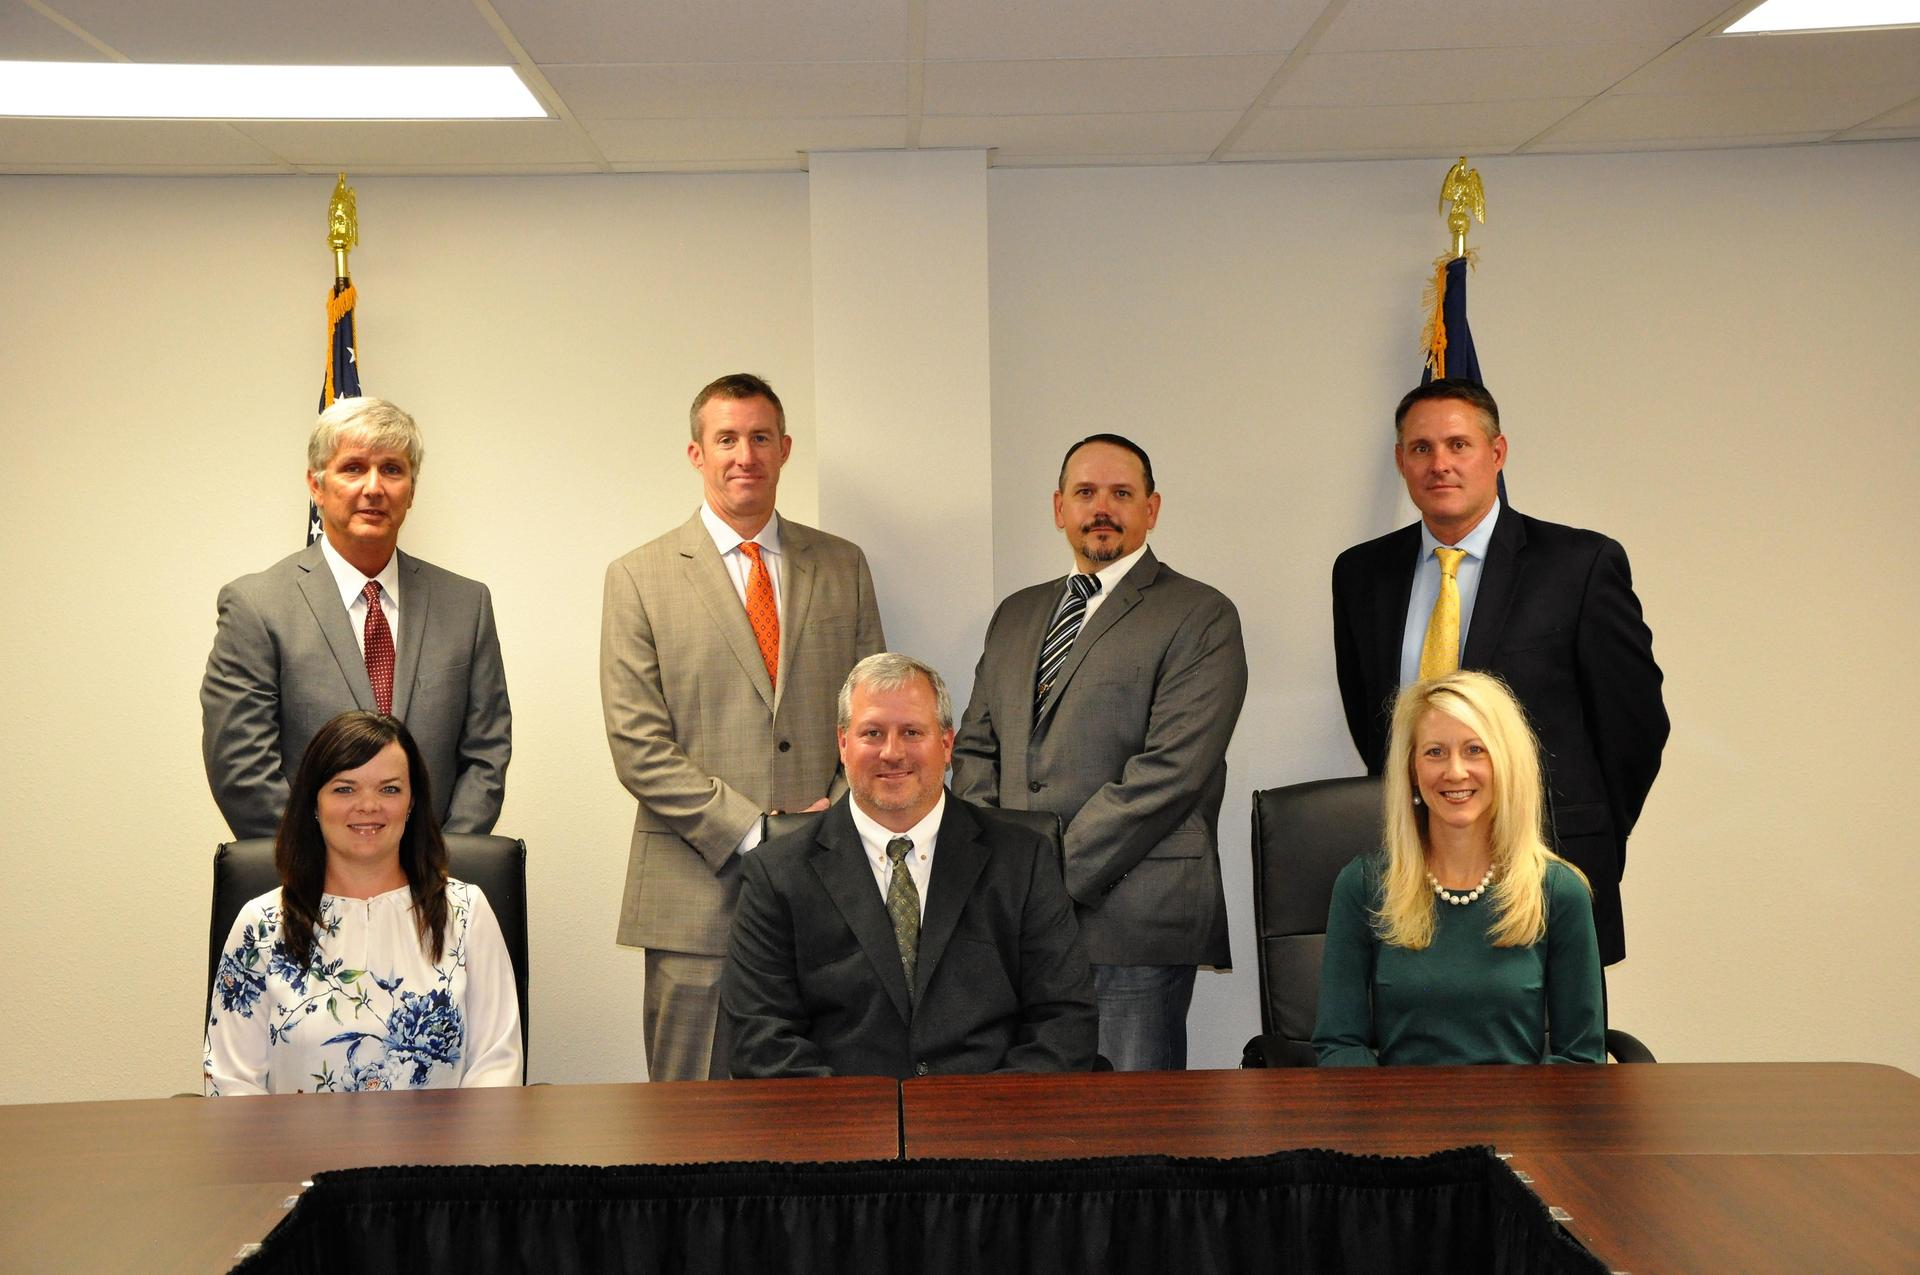 Canton ISD School Board Members